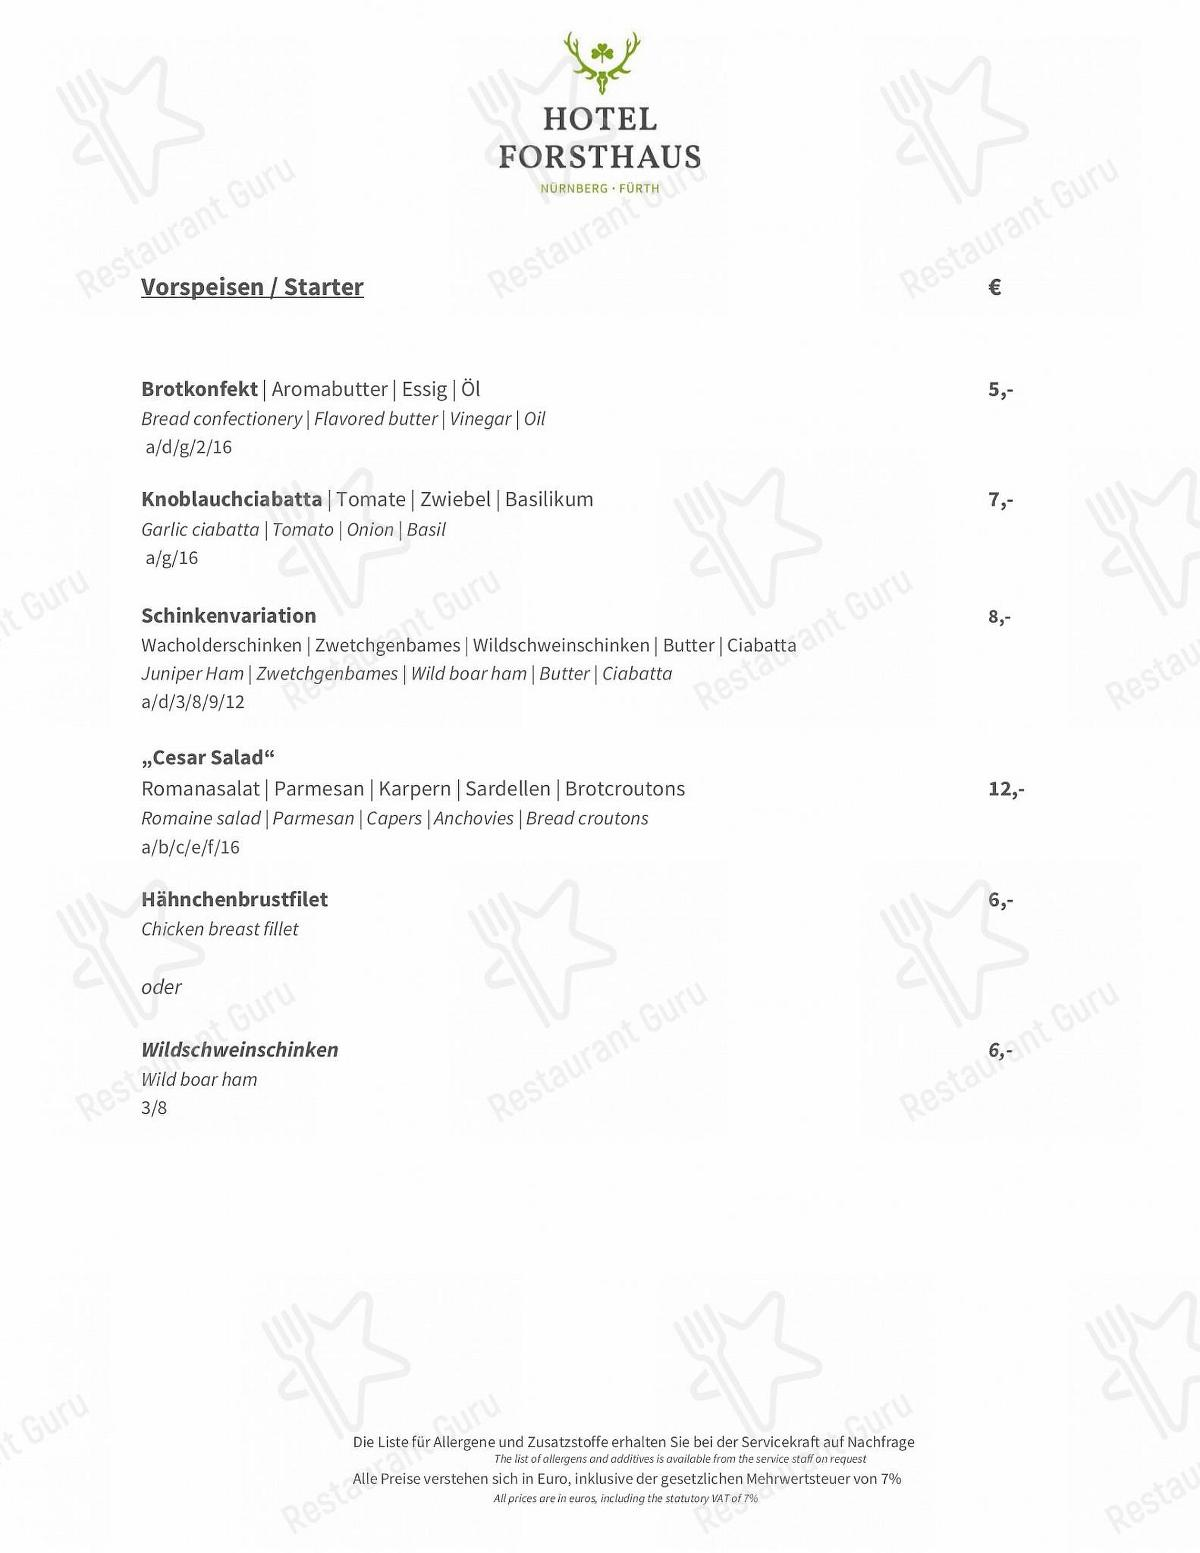 Speisekarte maximilians max Bar паба и бара NH Forsthaus Furth в Фюрте